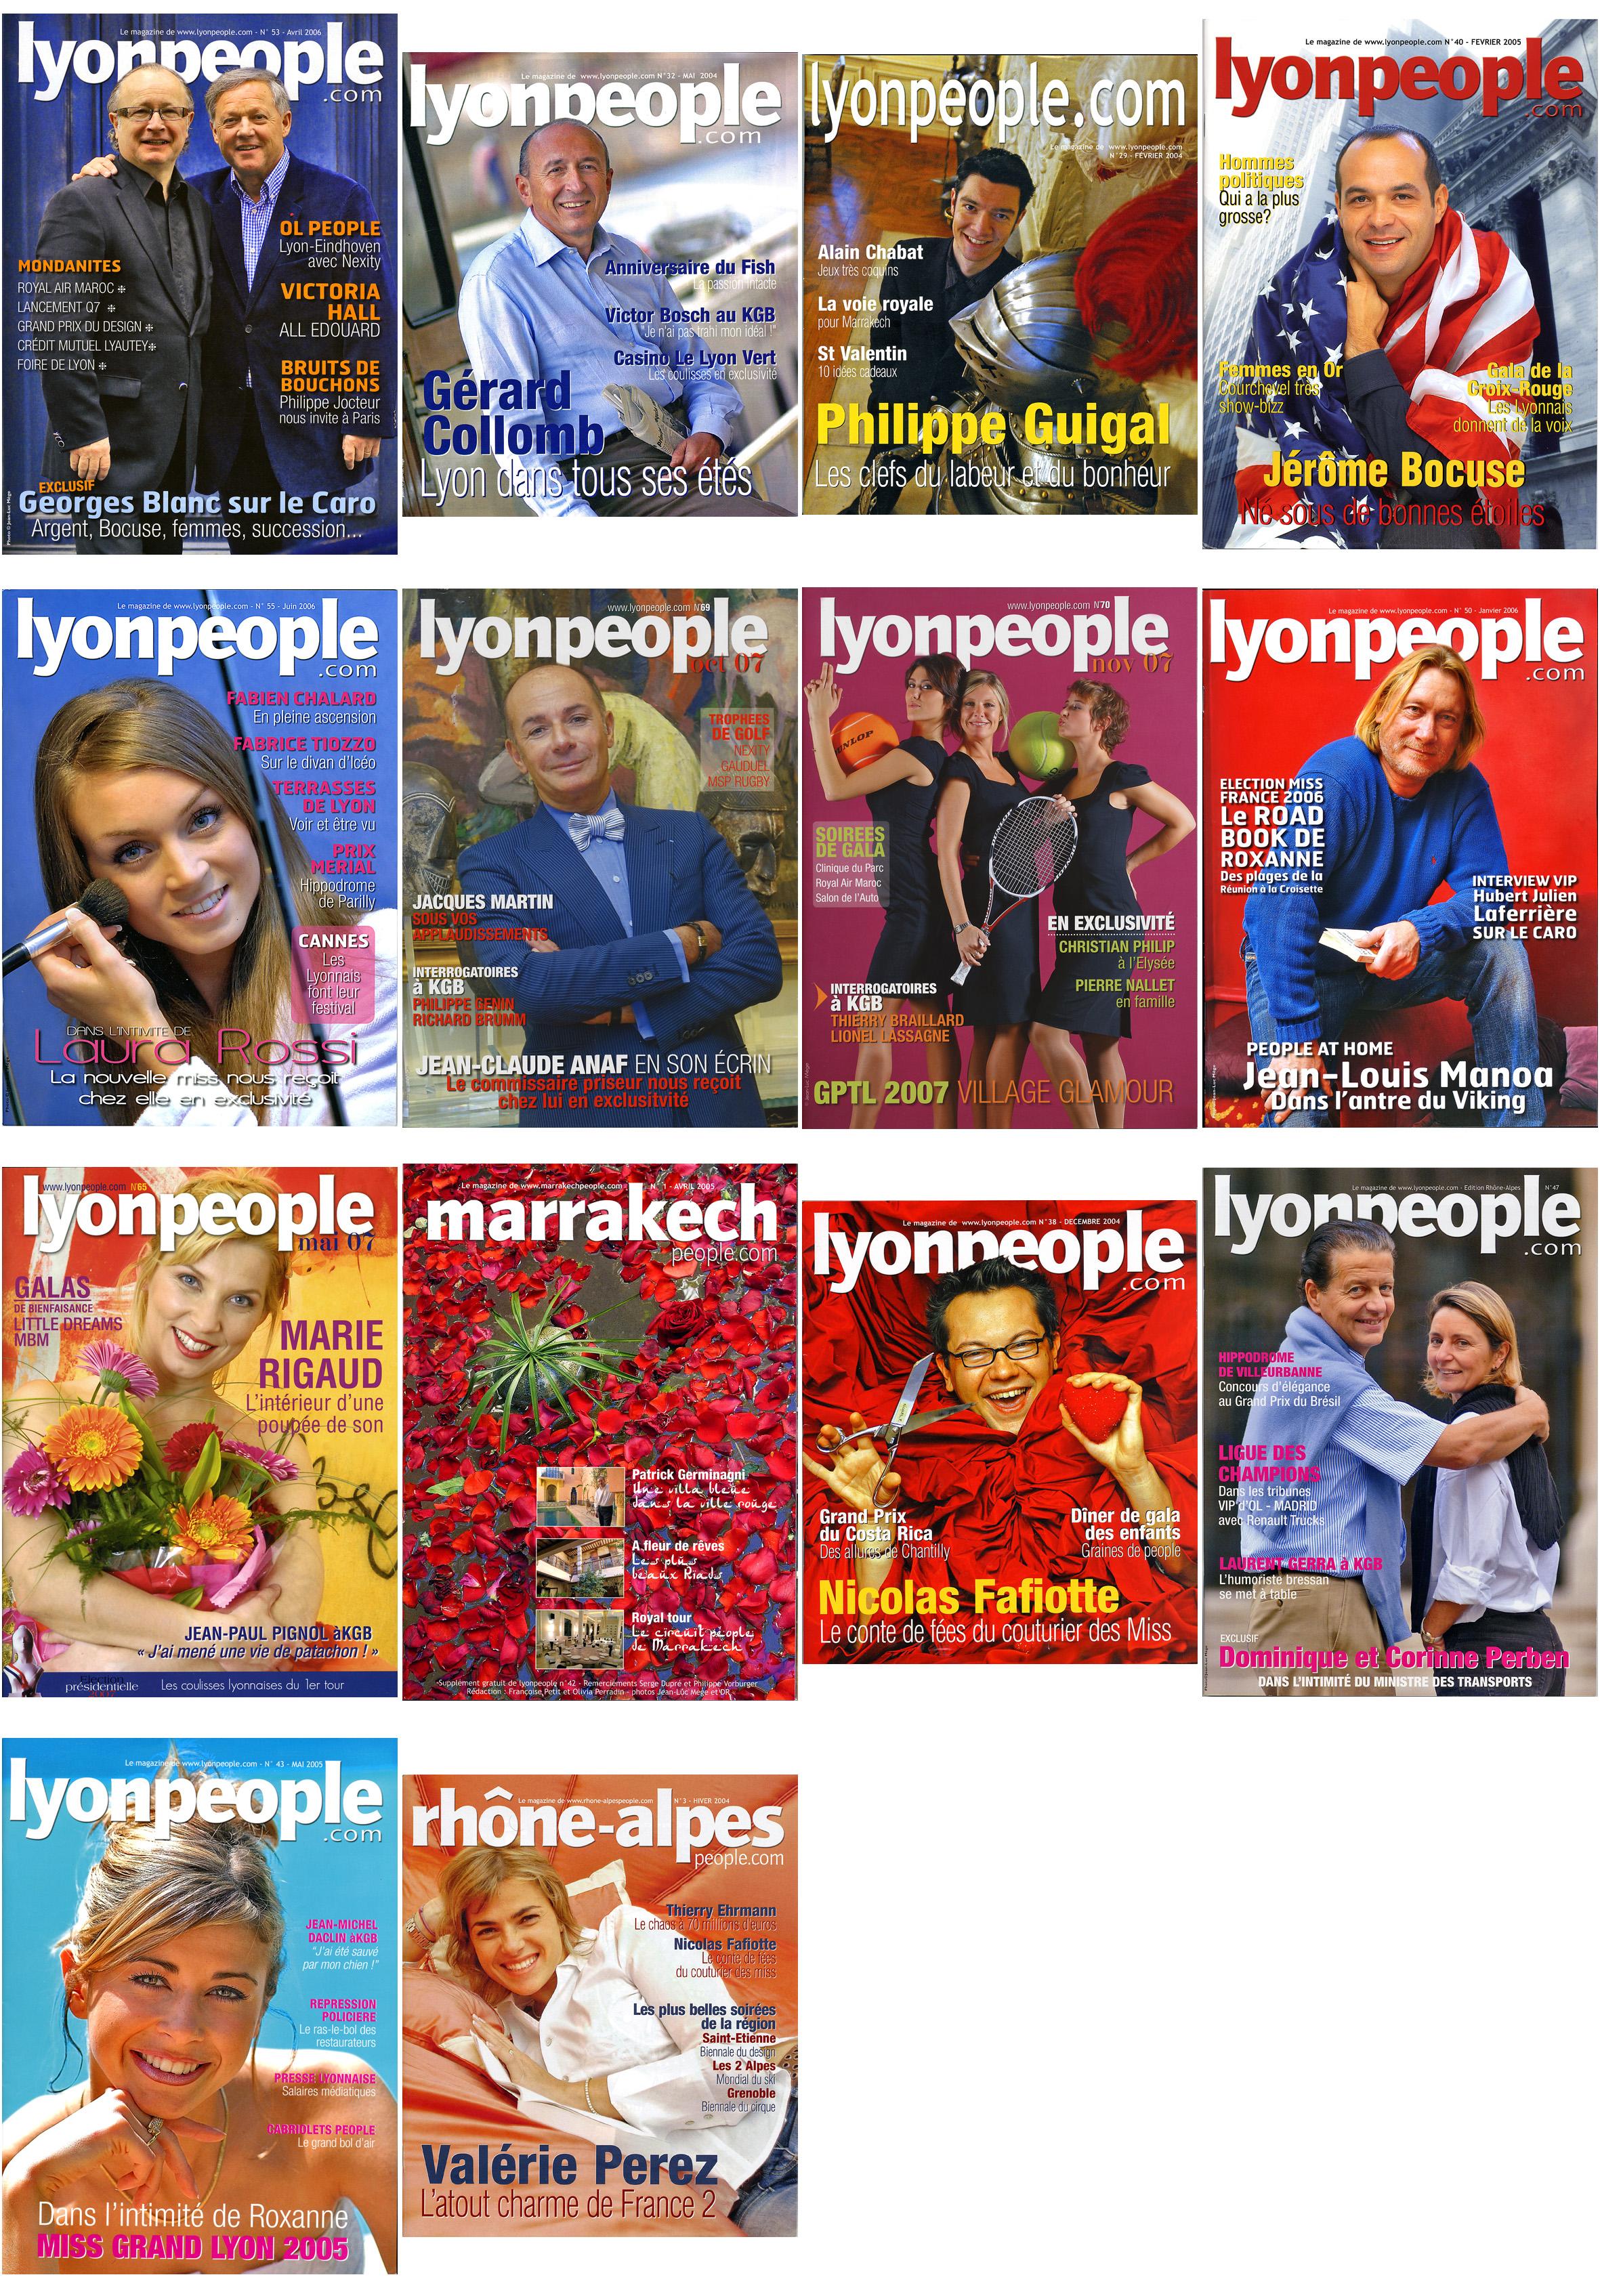 couvertures magazines lyon people